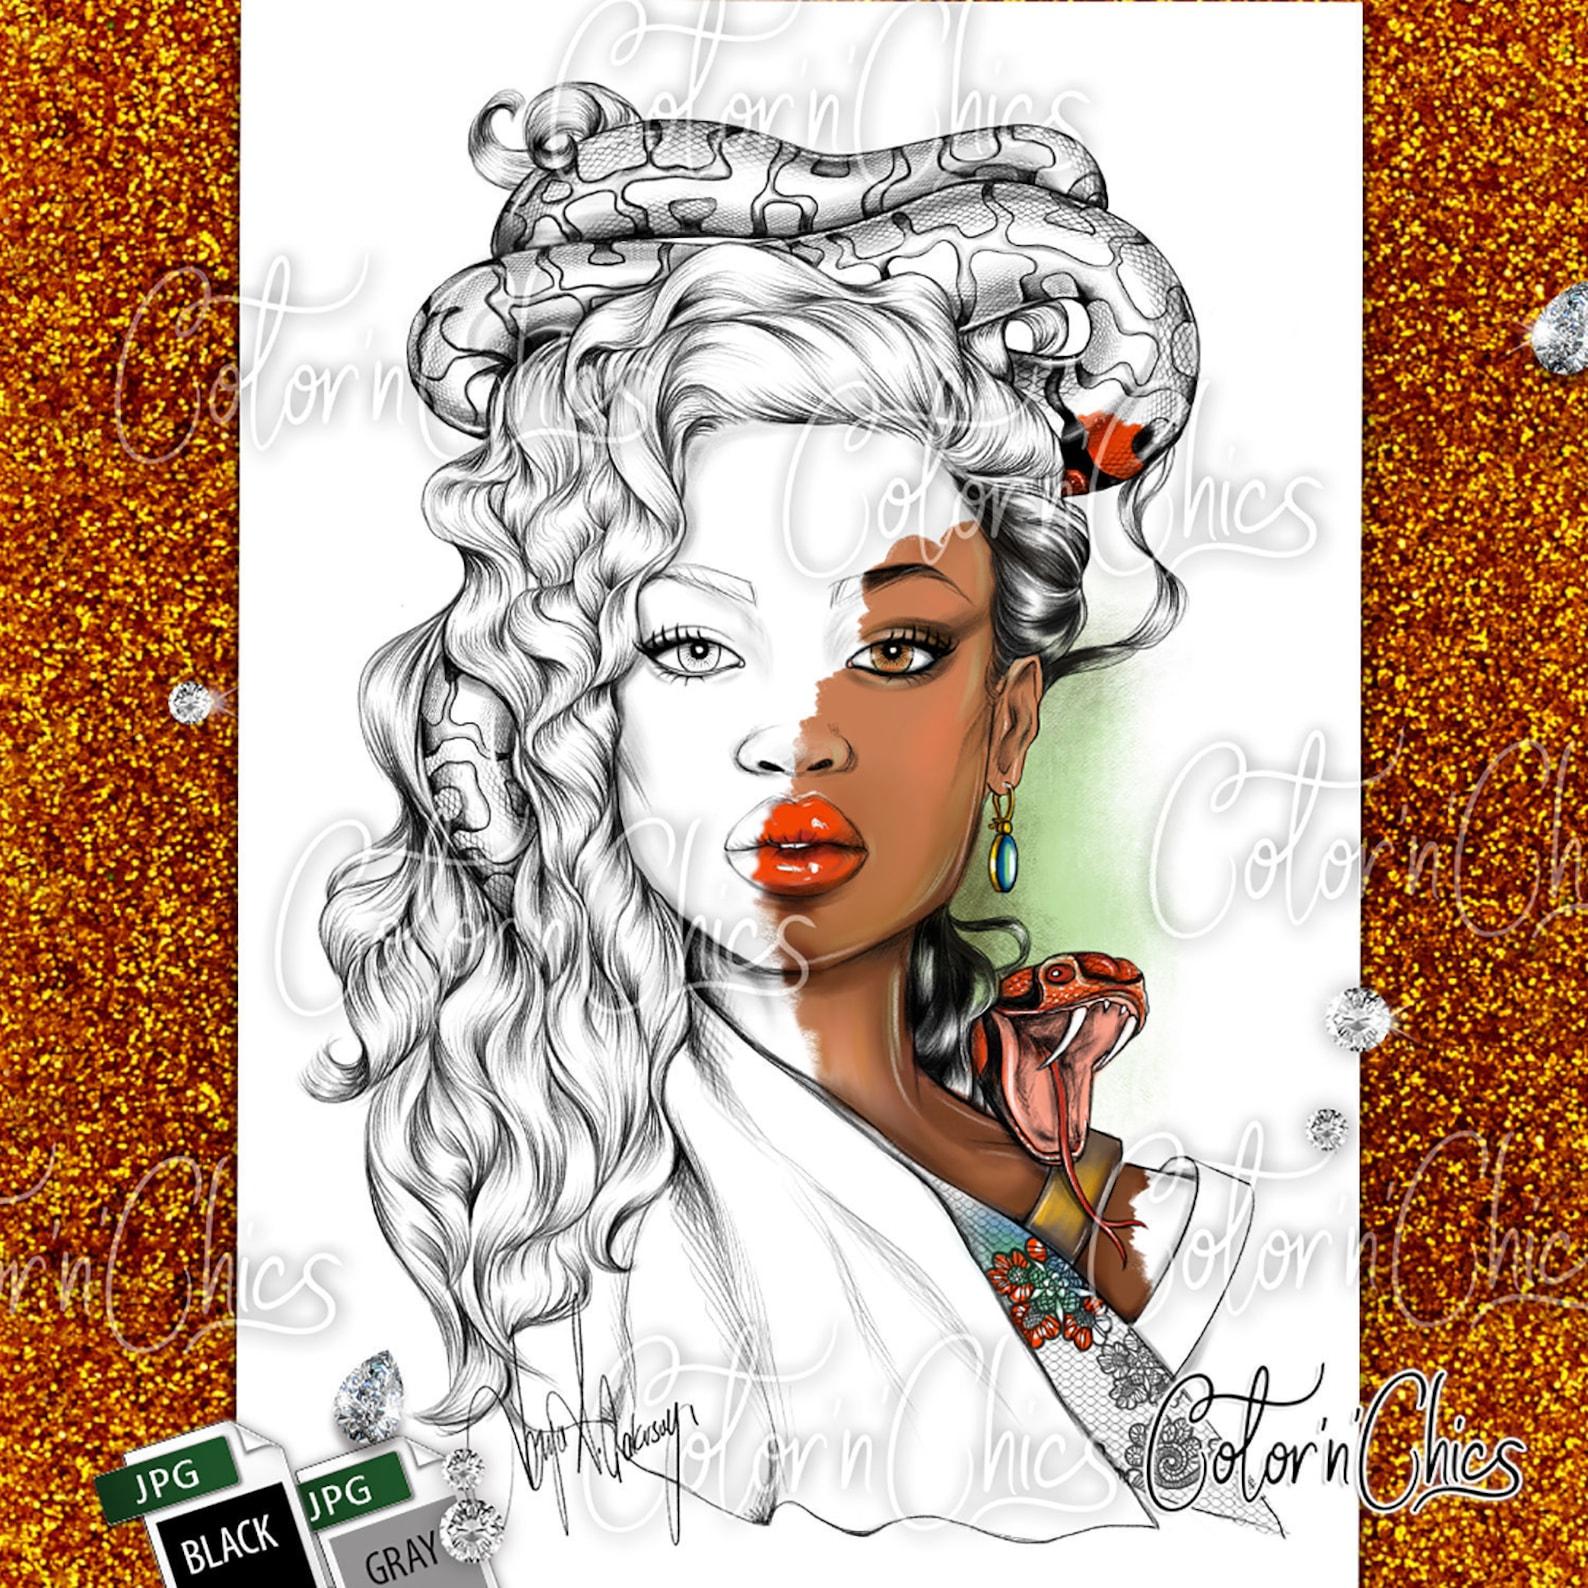 Snake Queen from Etsy Artist Derya Çakırsoy